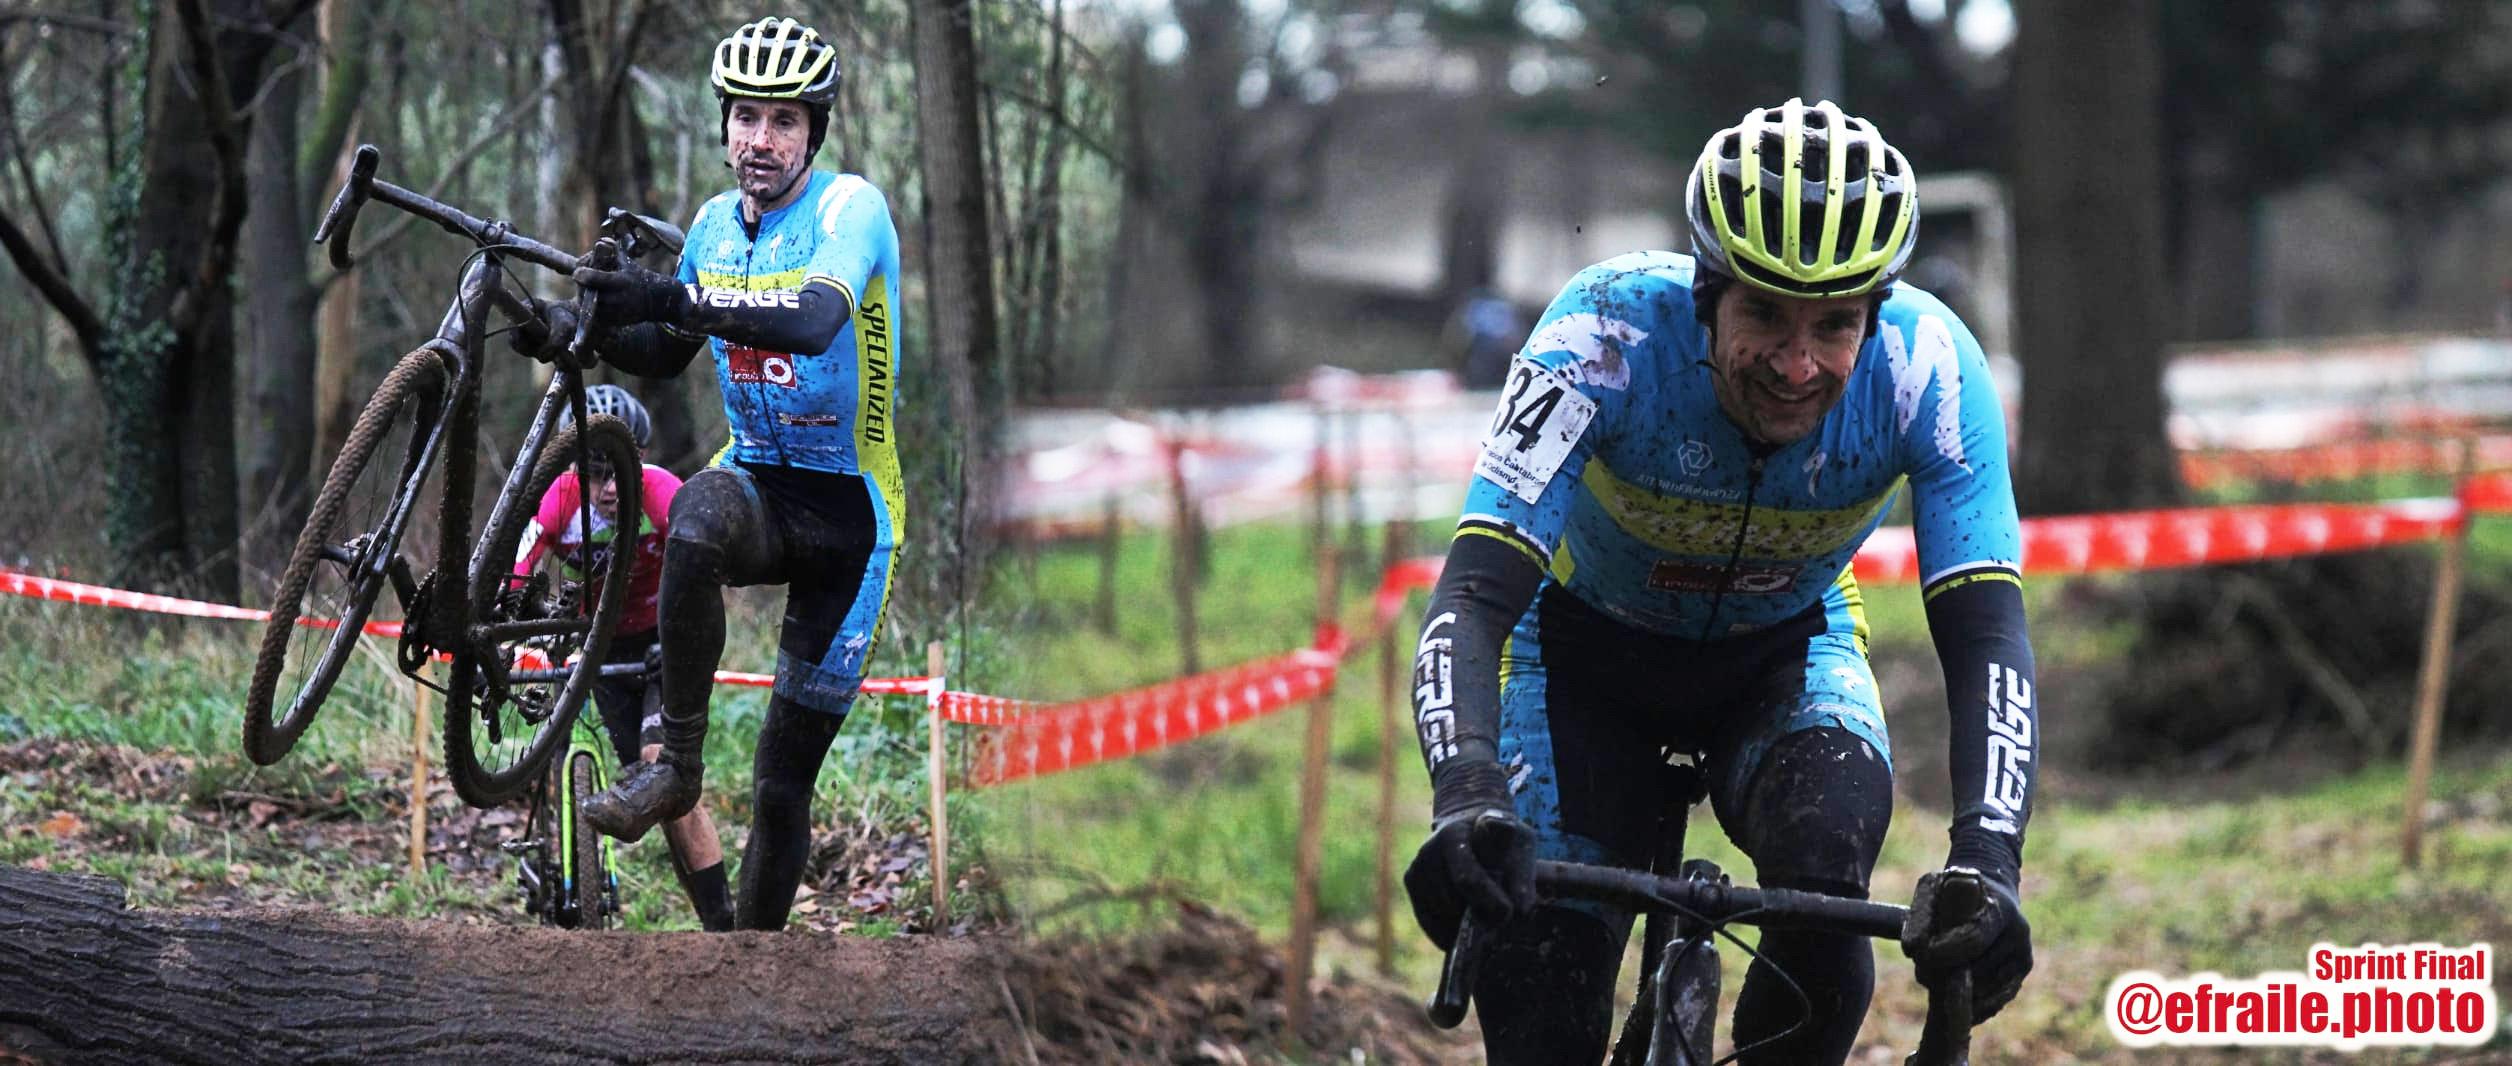 Aitor Hernandez ISB Sport Campeonato de España ciclocross